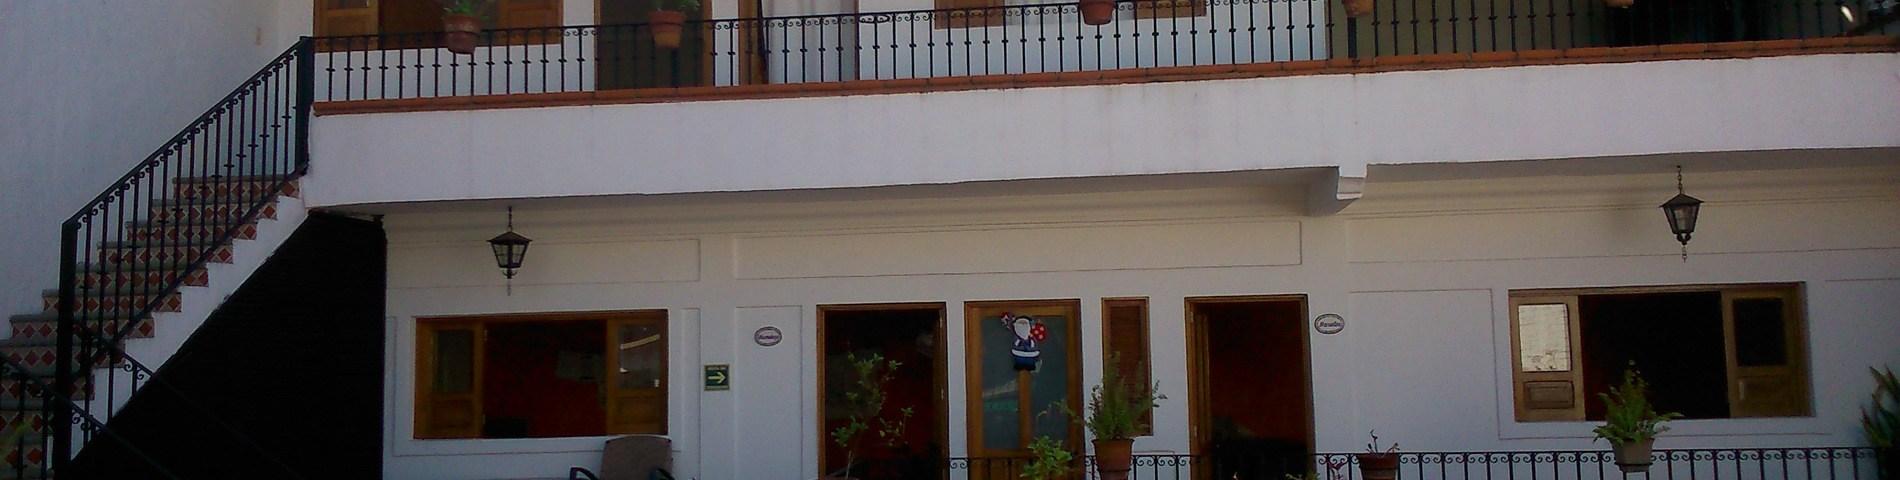 Spanish Experience Center kép 1